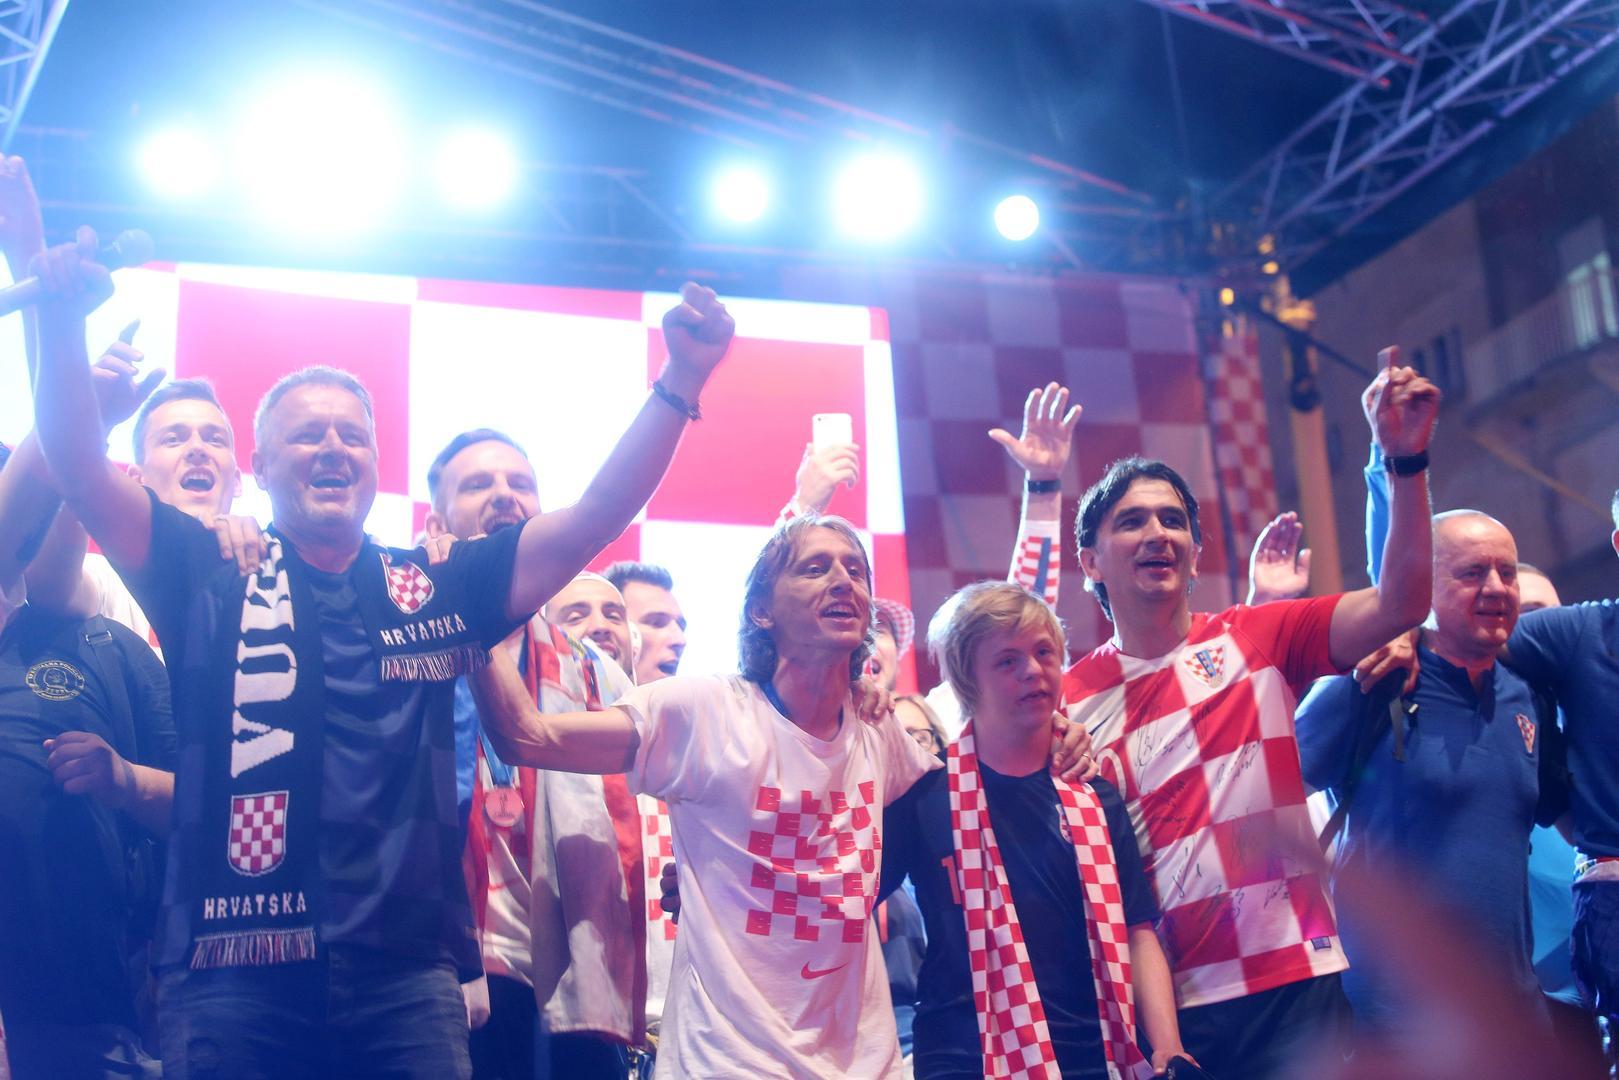 http://hrvatskifokus-2021.ga/wp-content/uploads/2018/07/c6fa81f5648fd183fa371.jpeg